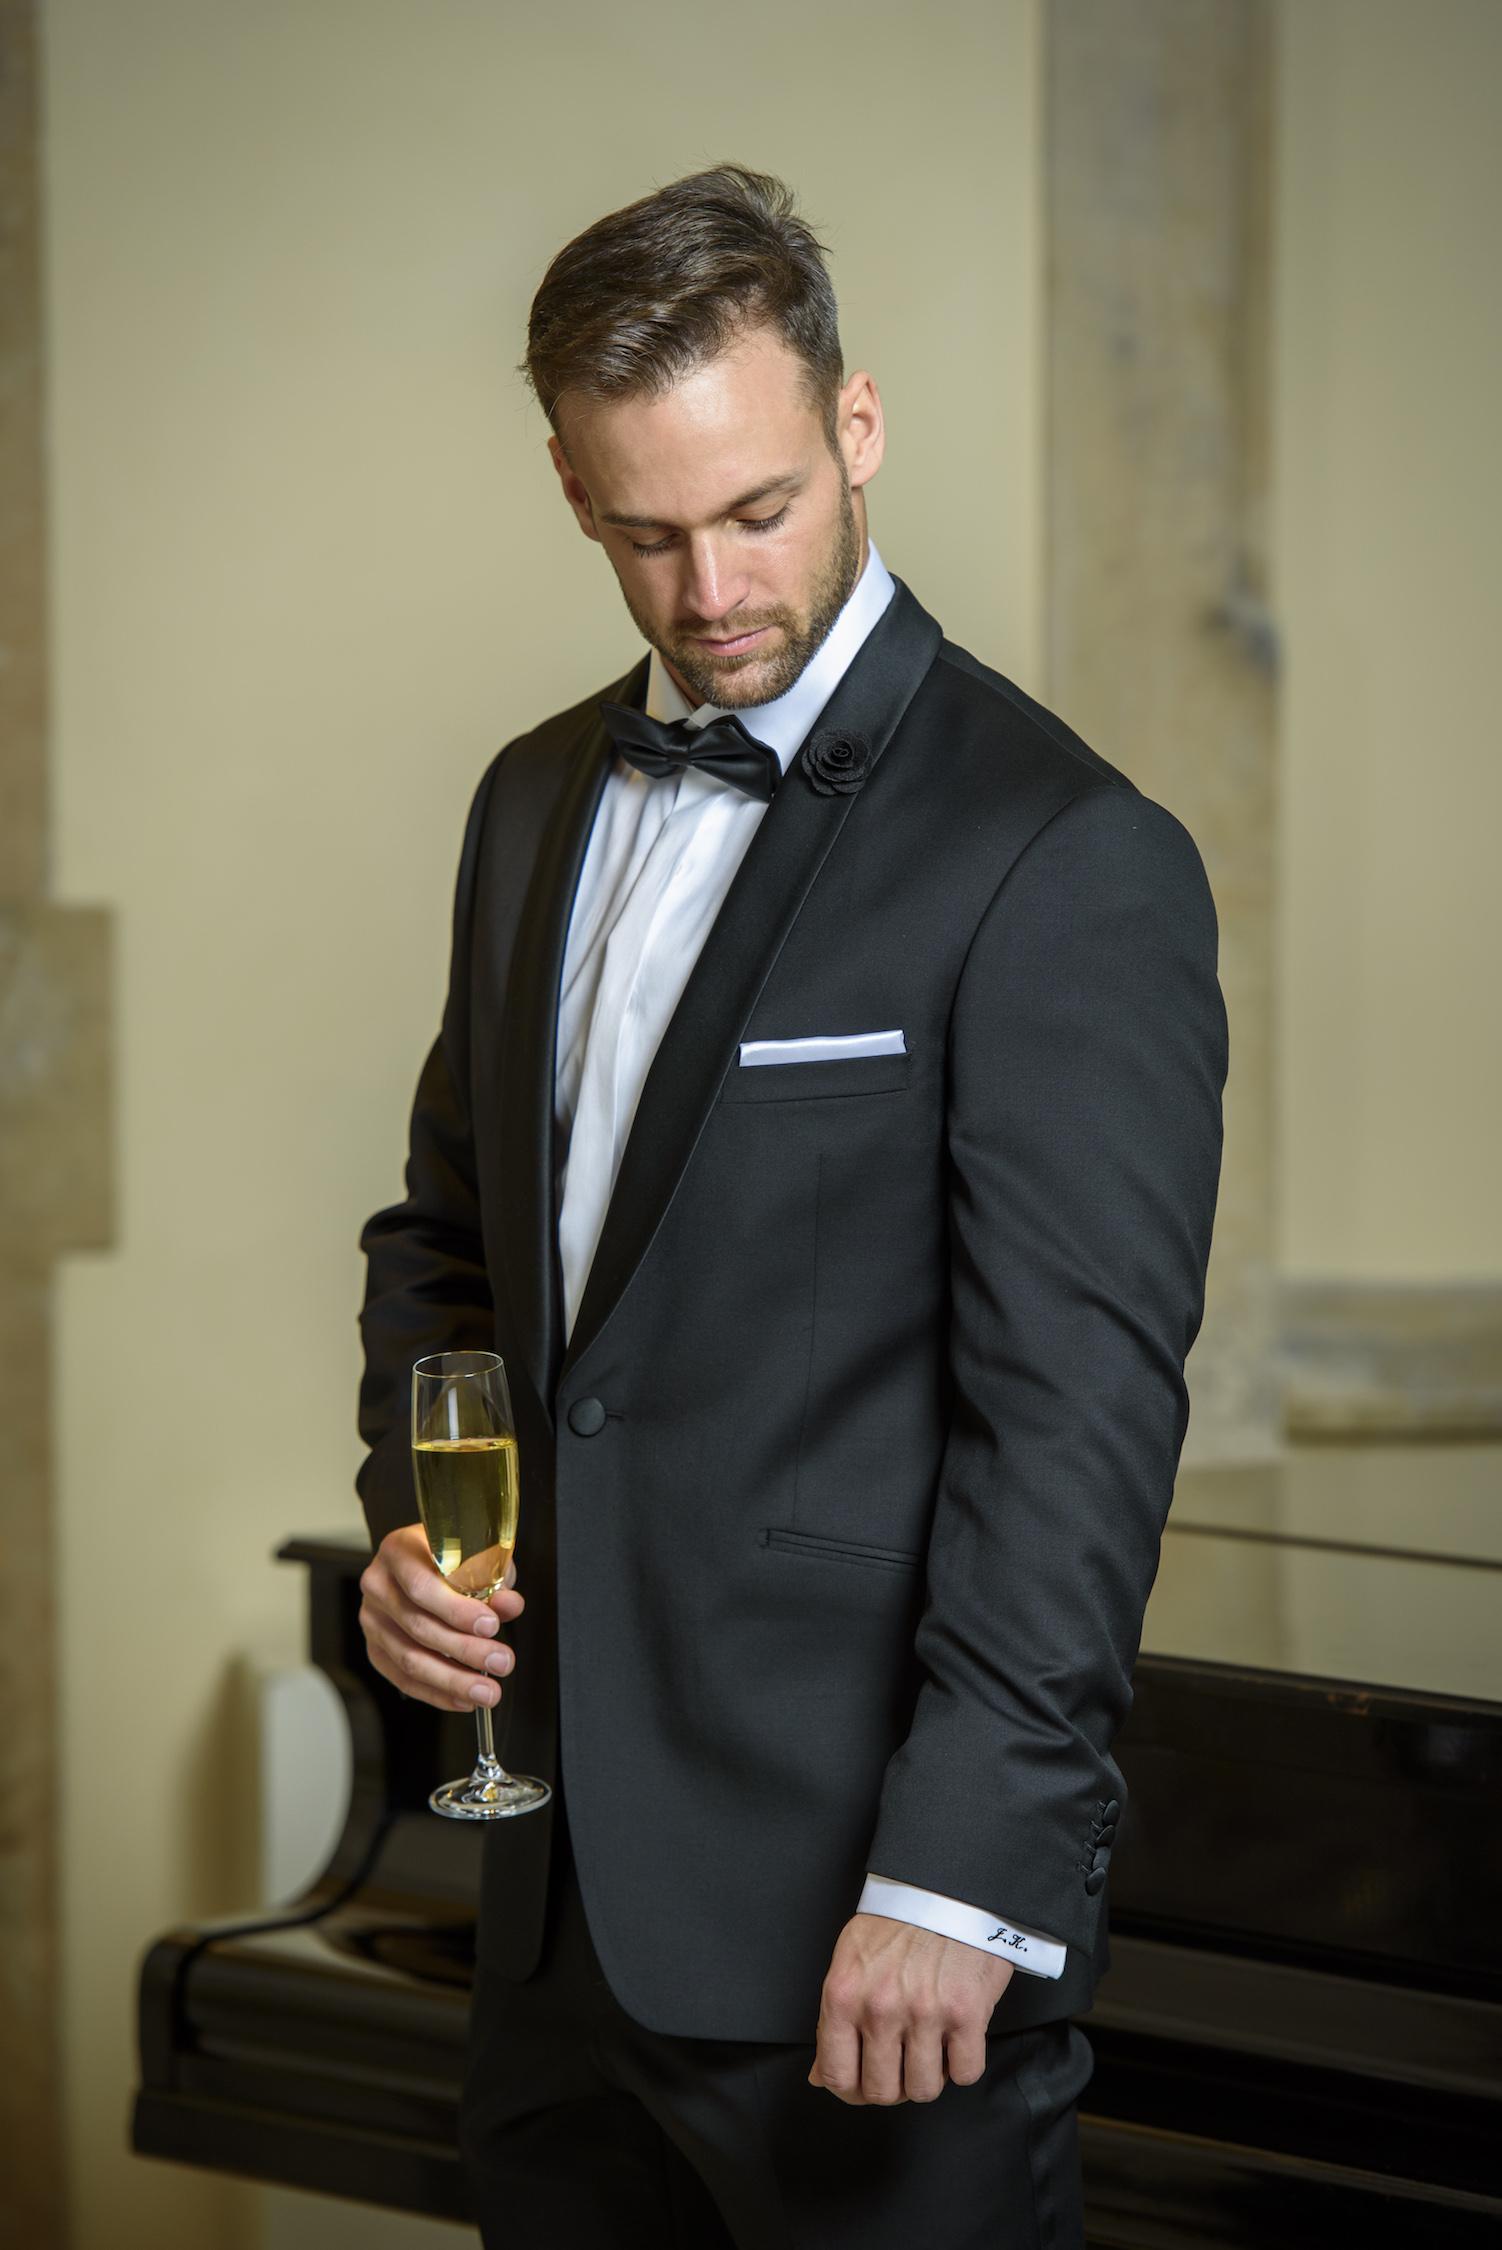 Svatebni Special 2 Obleknete Formalni Svatbu V Kostele Obleky